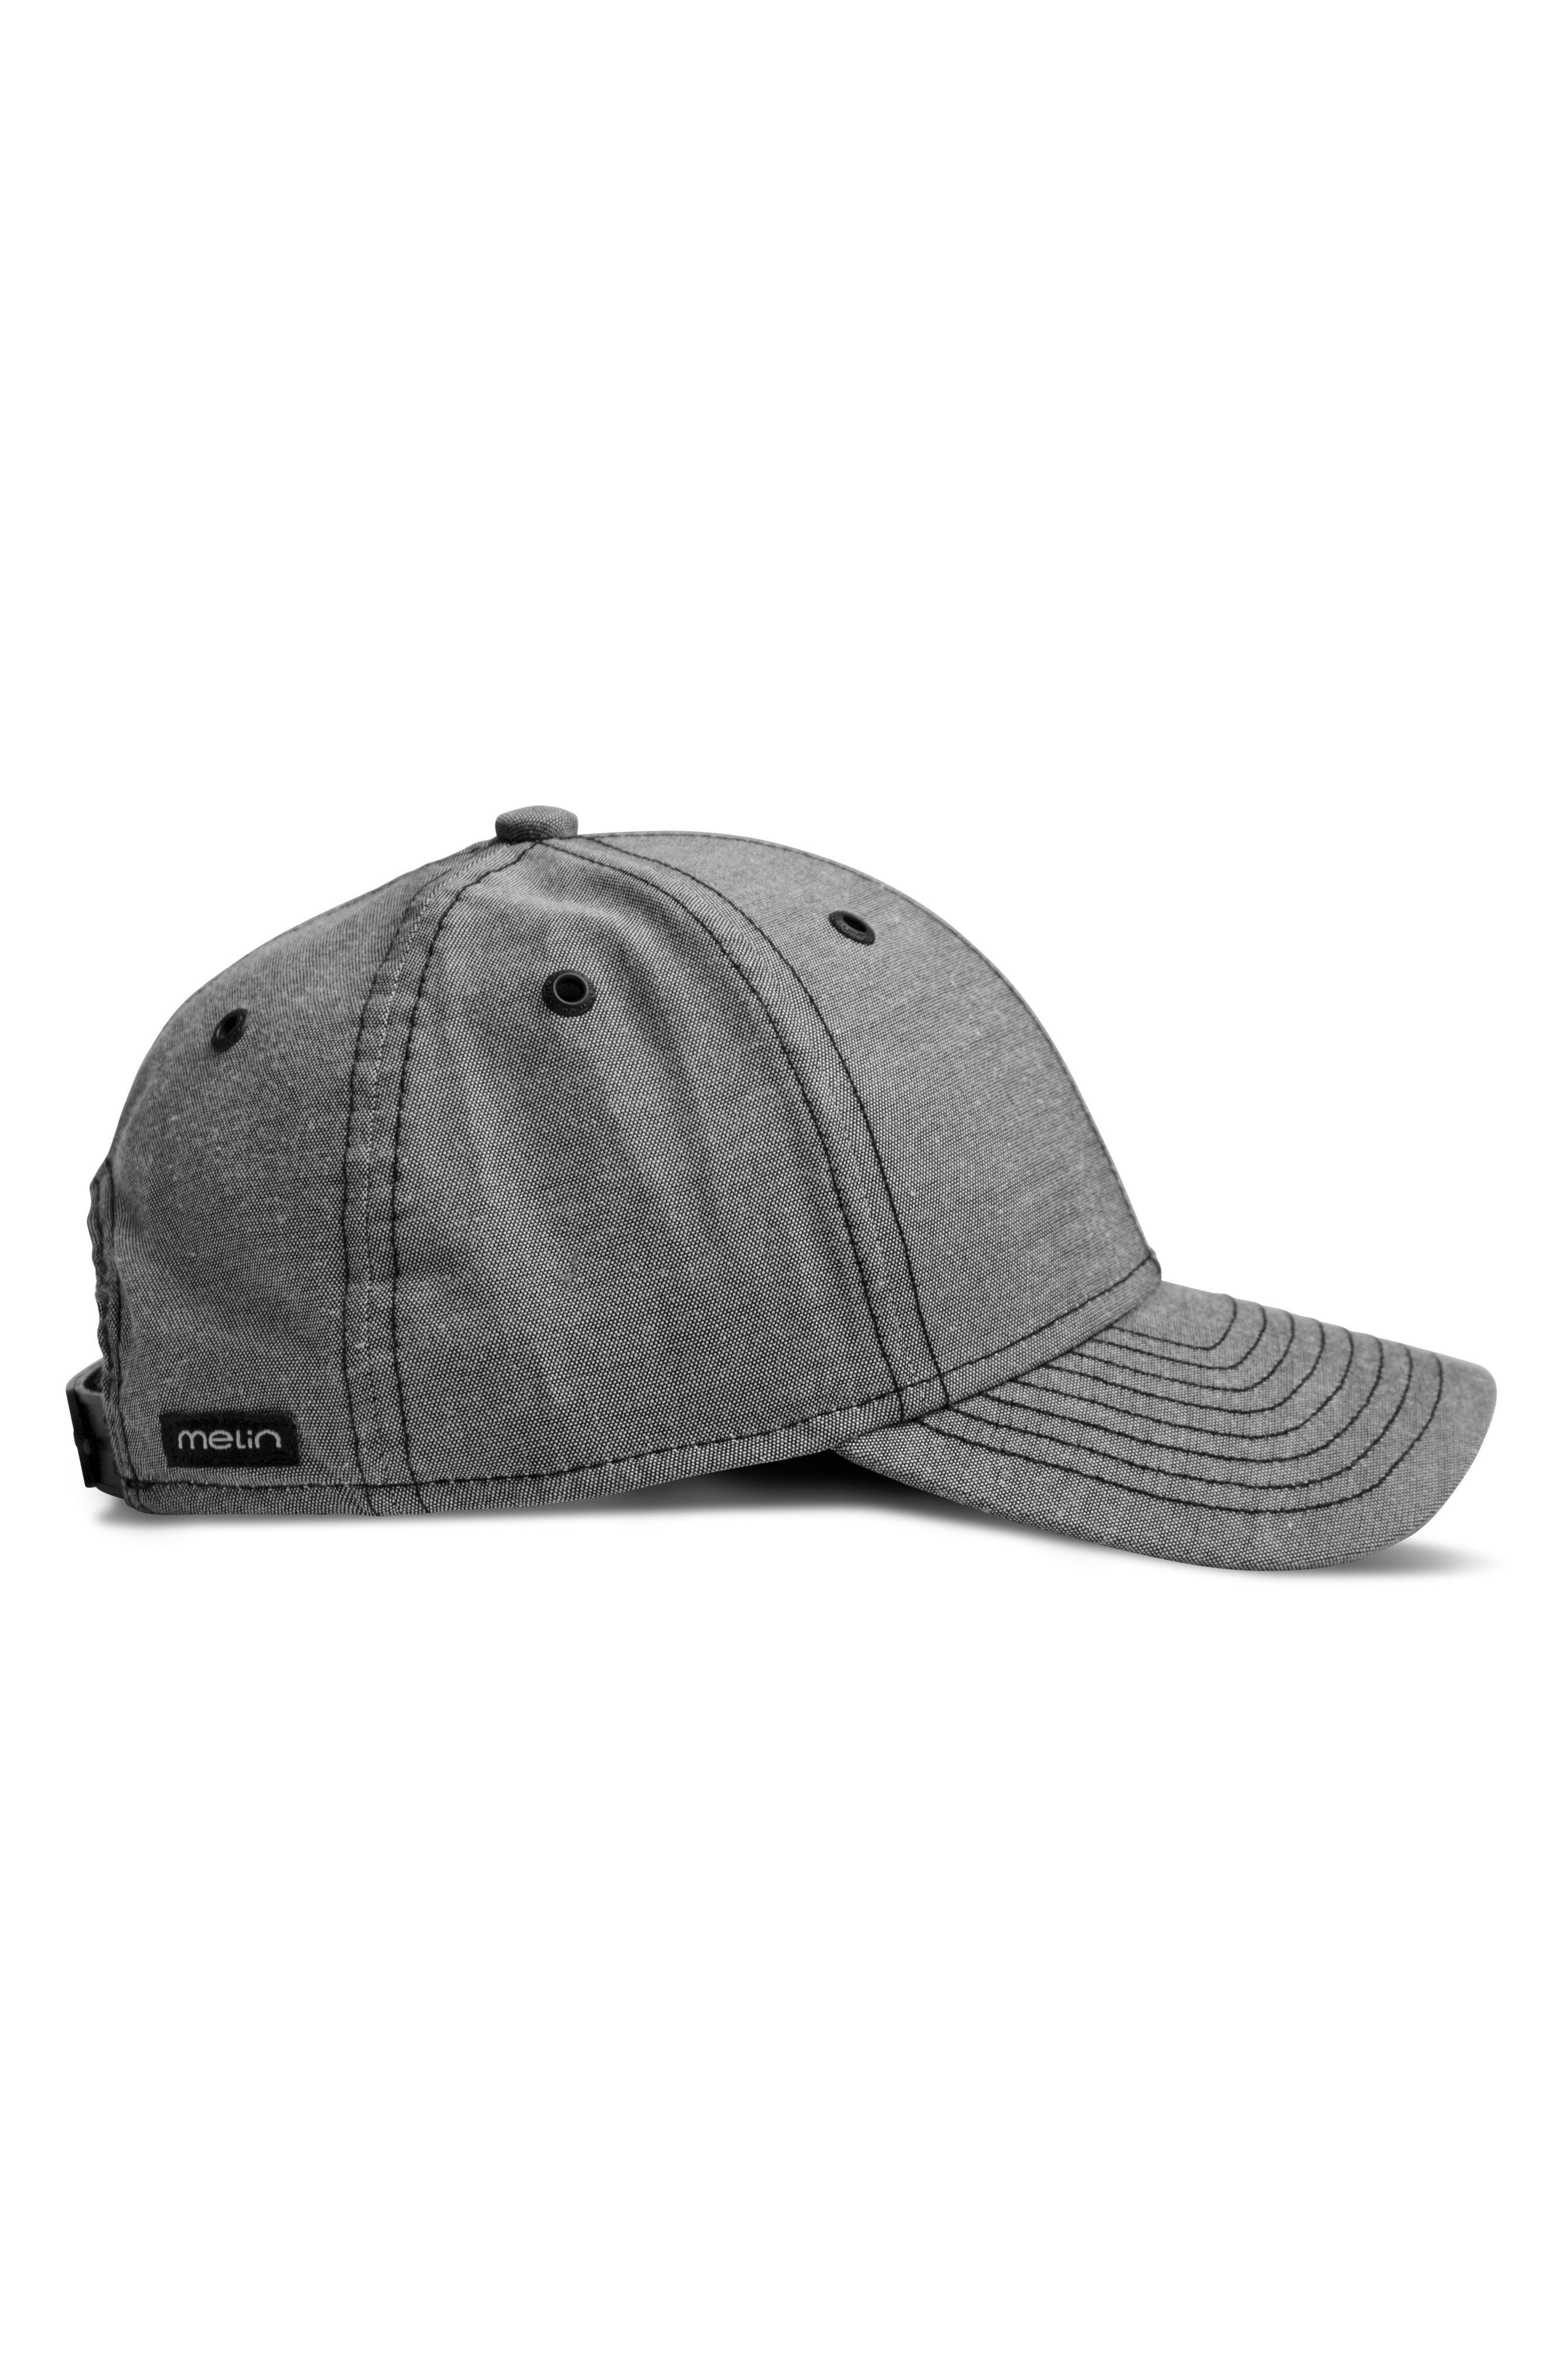 Scholar Snapback Baseball Cap,                             Alternate thumbnail 4, color,                             001